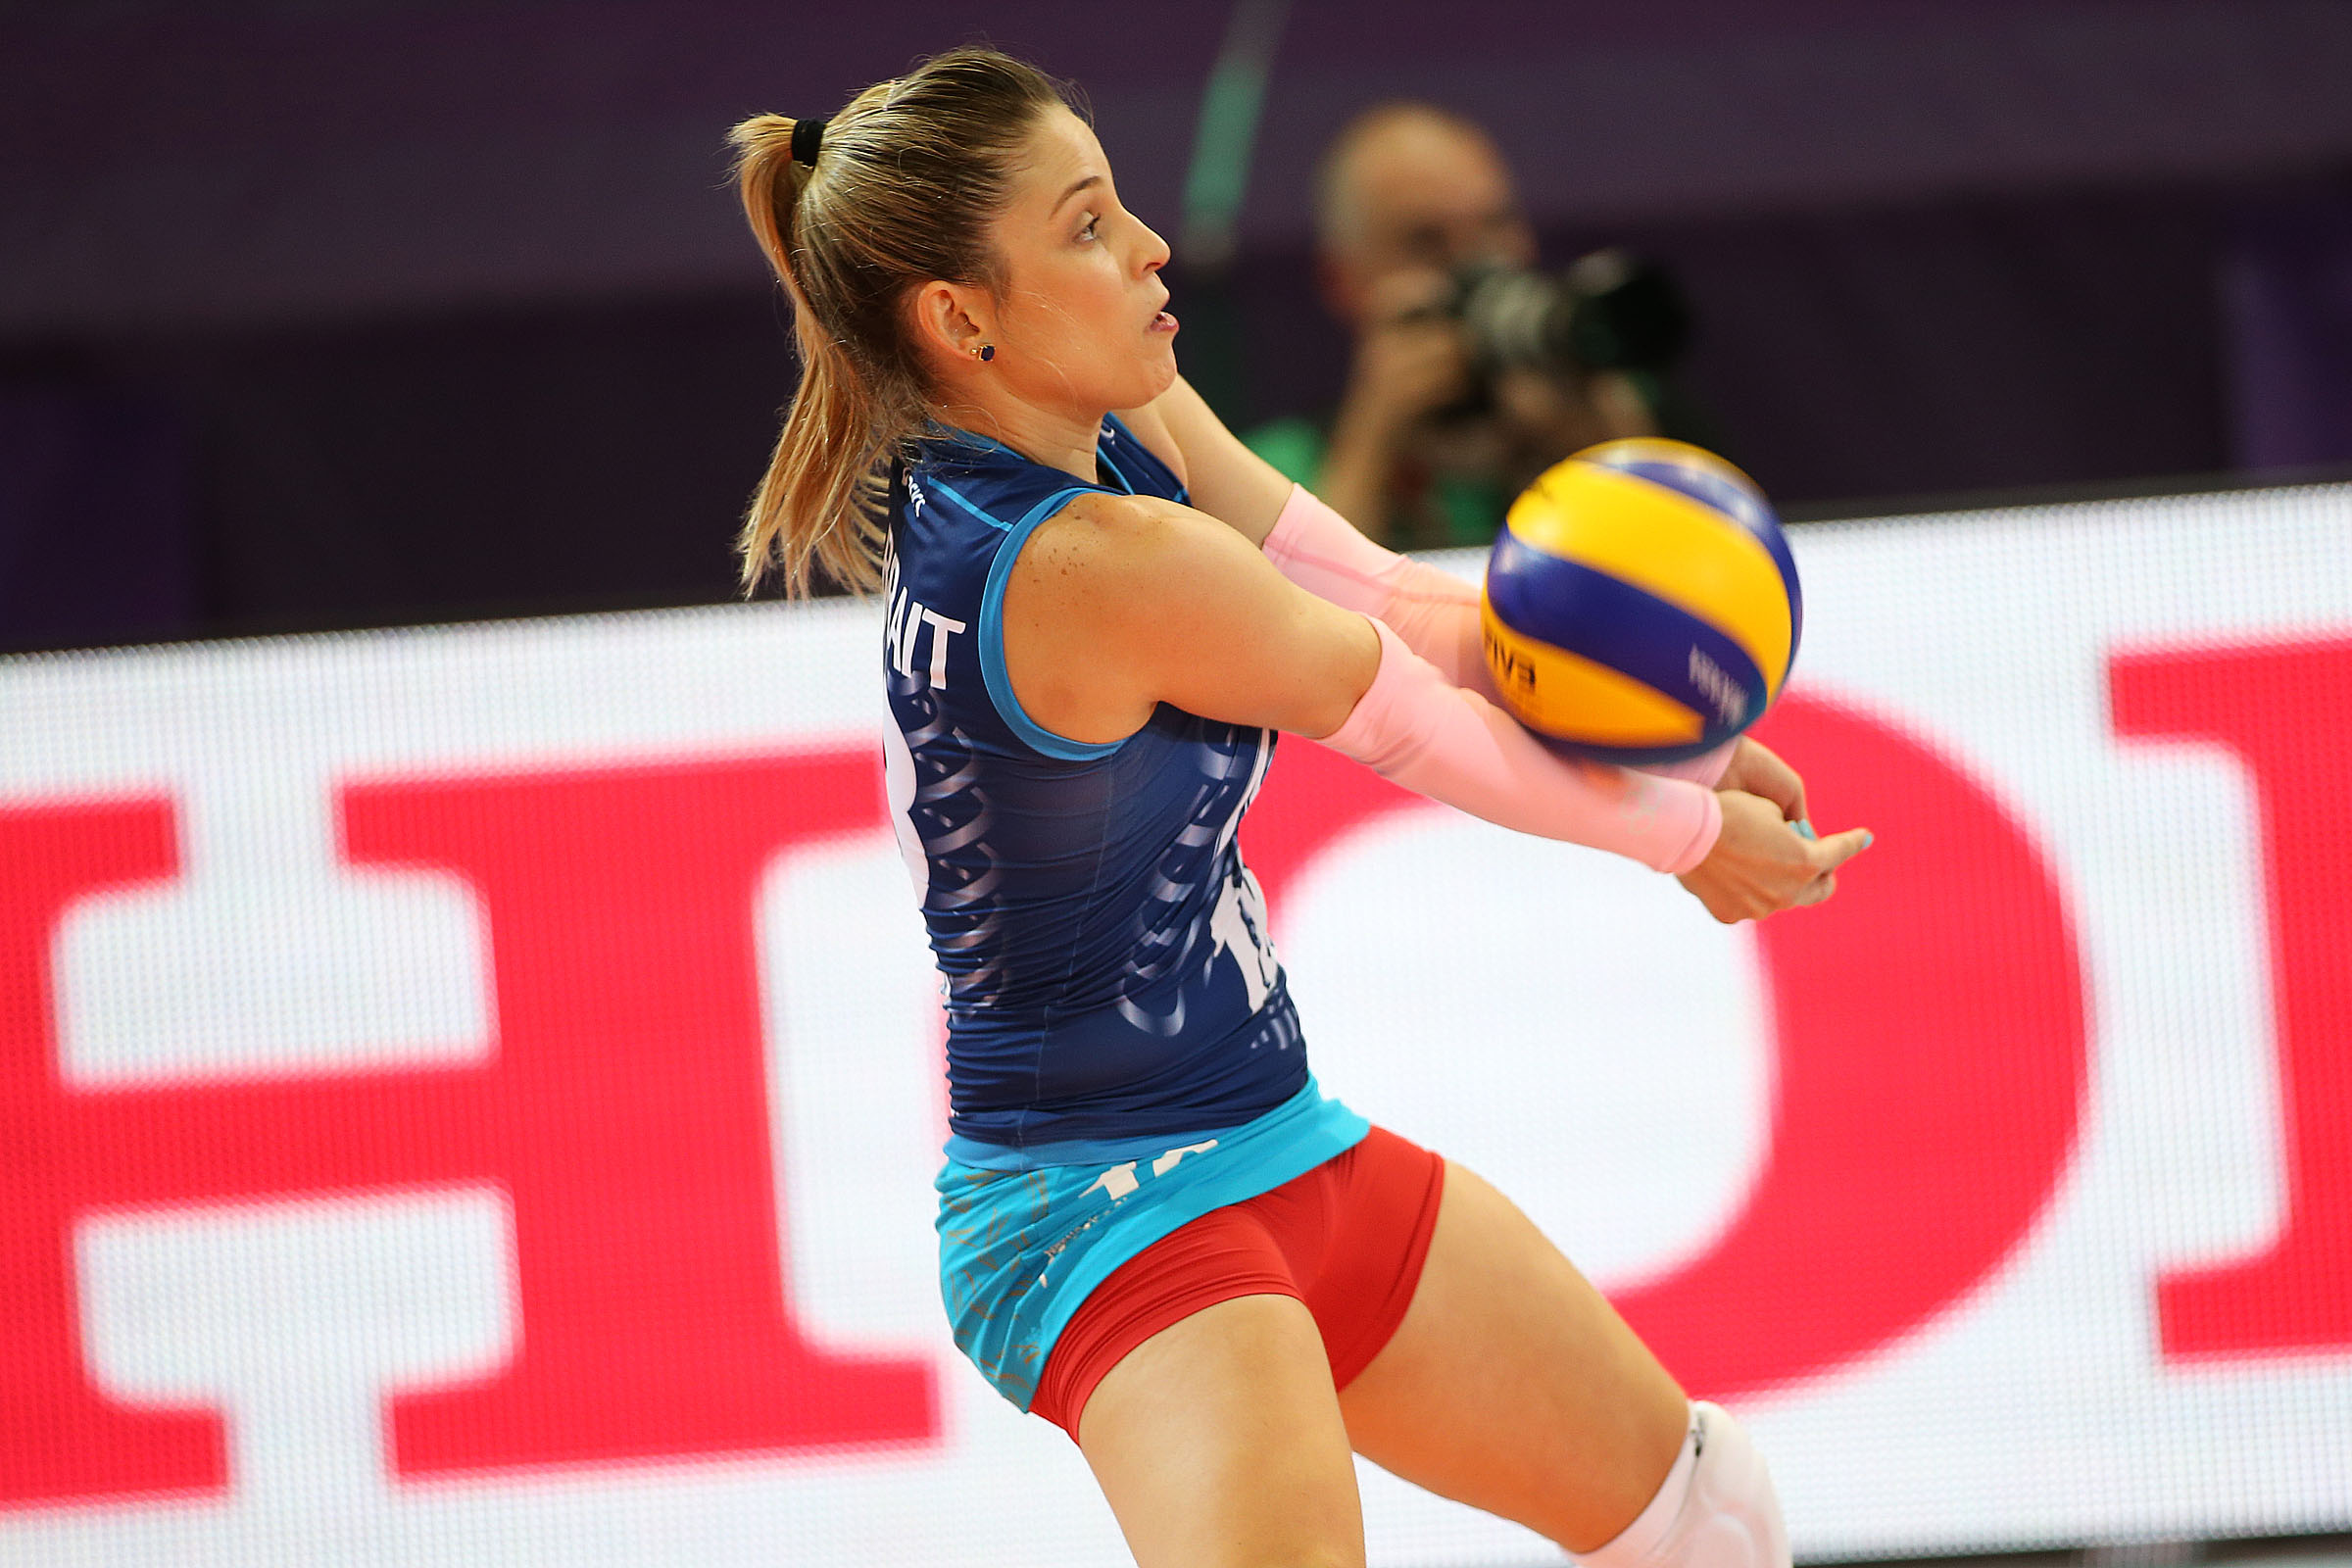 women's volleyball - HD2400×1600